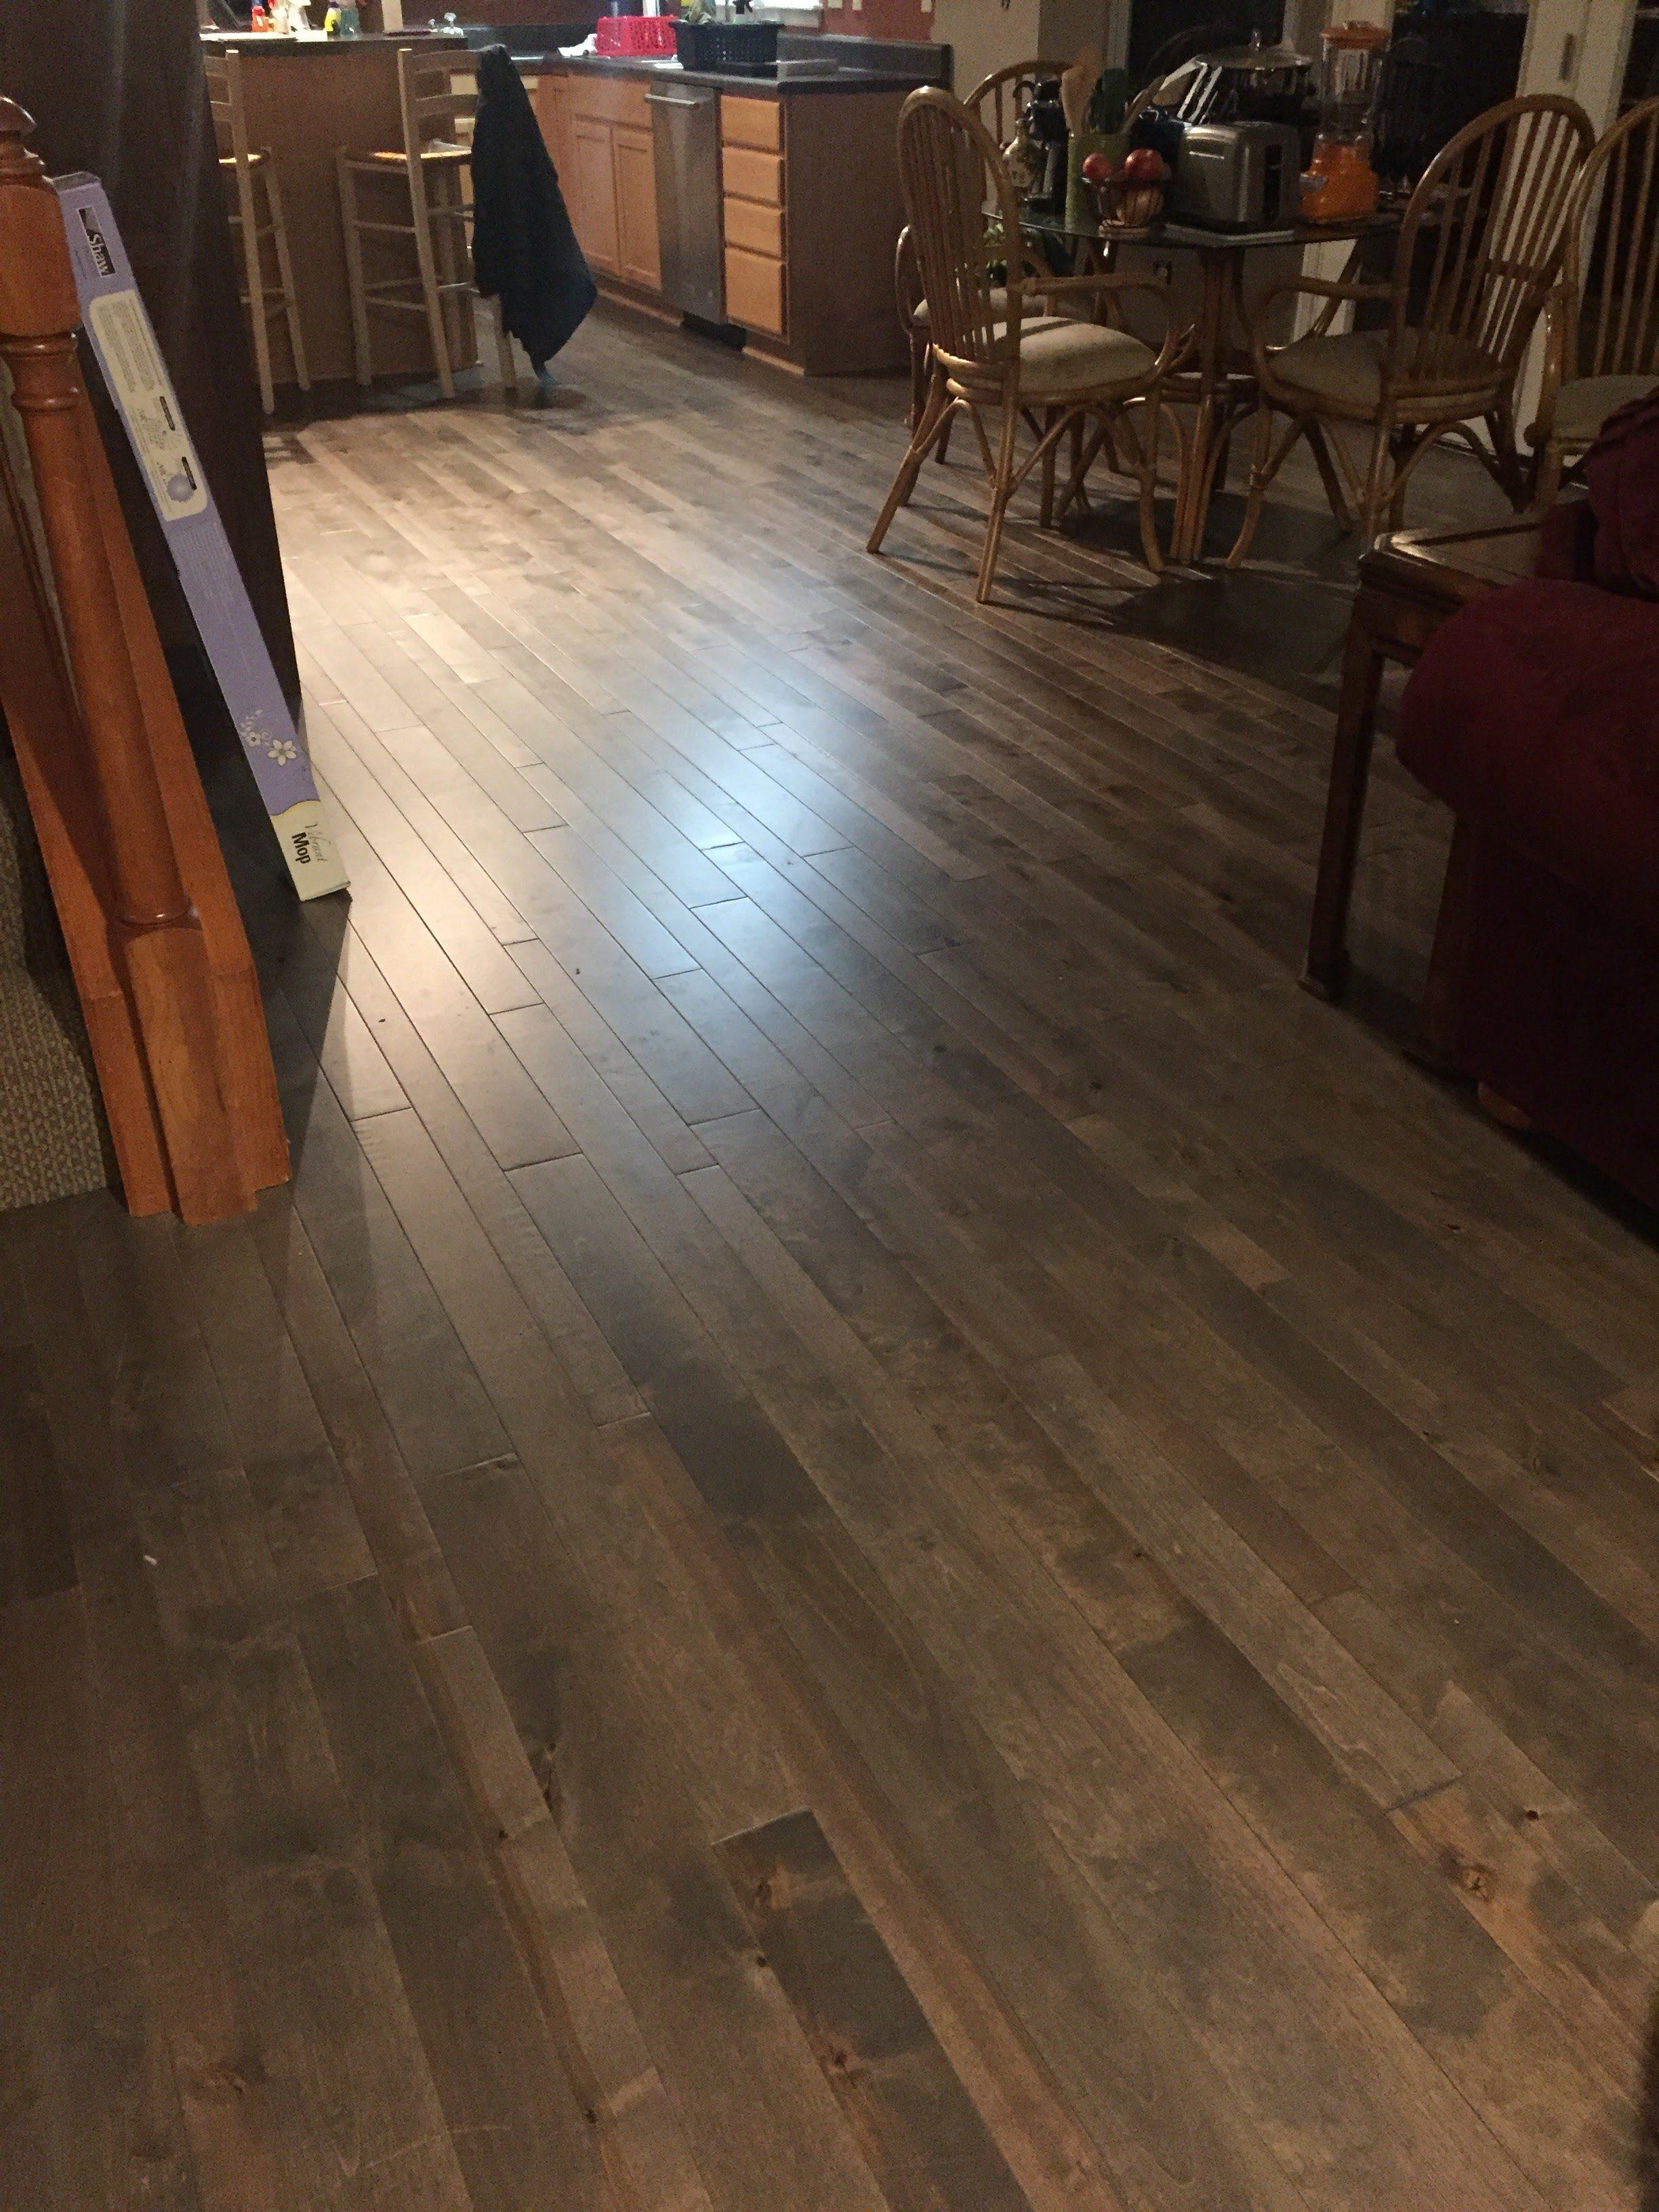 Hardwood floors in West County